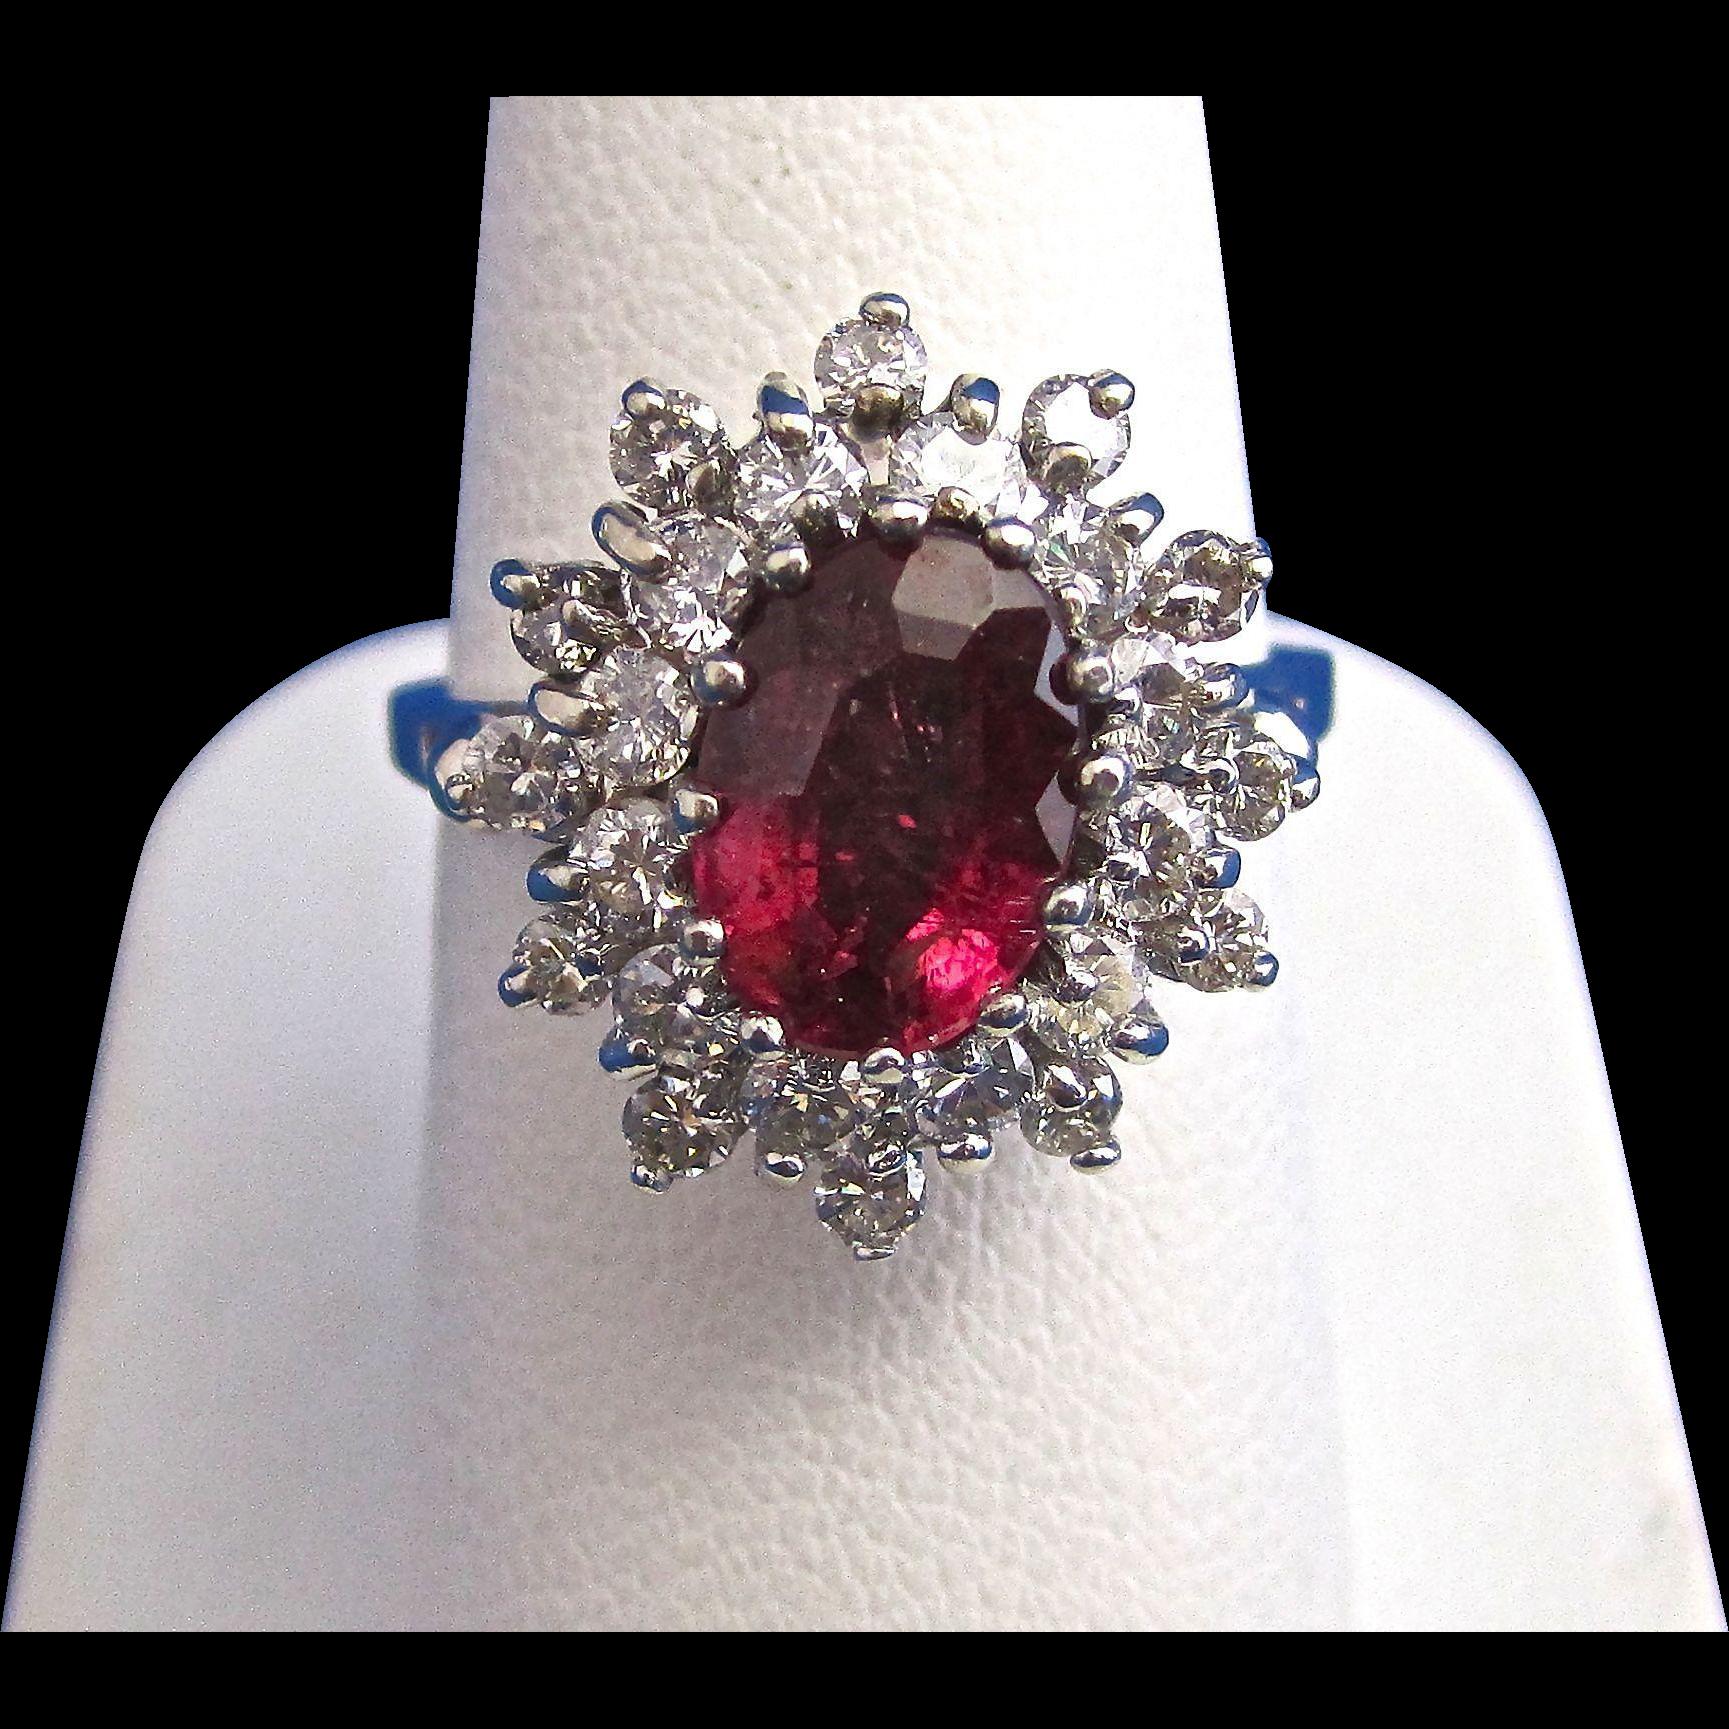 Vintage Estate Natural Rubellite & Diamond Engagement/Birthstone Halo Ring 14K White Gold